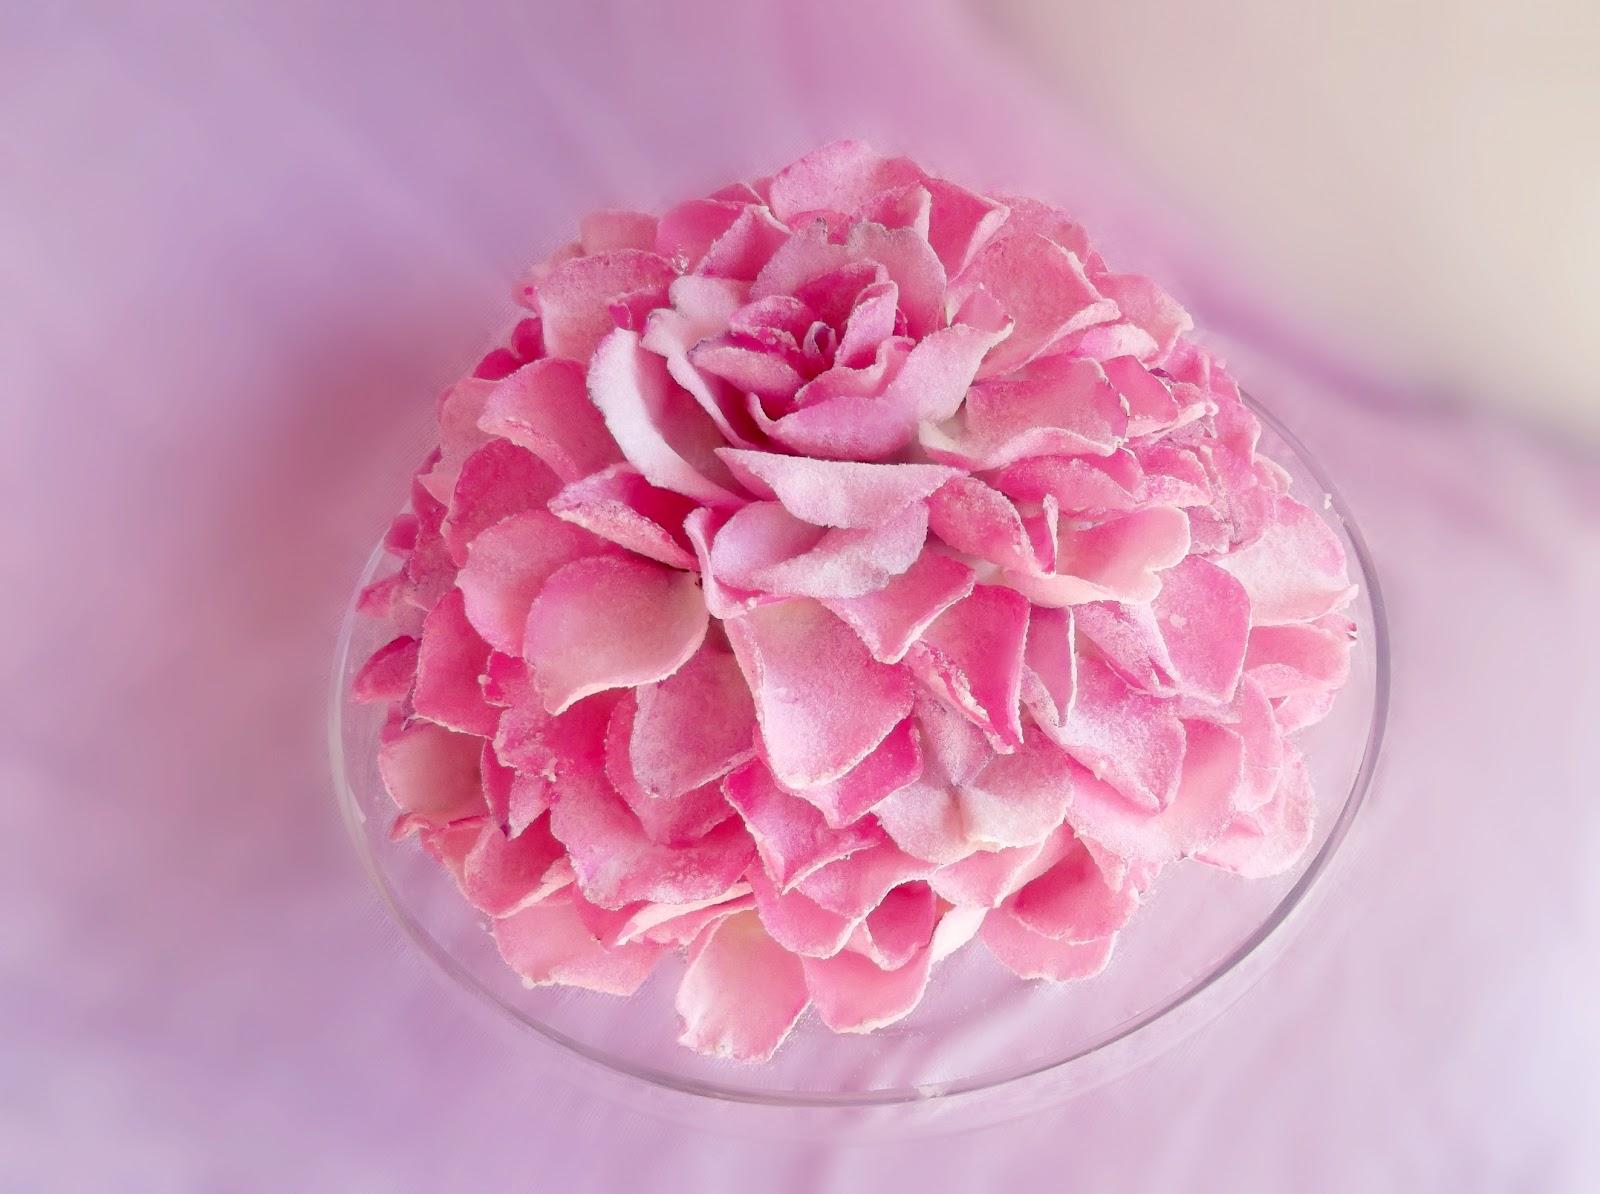 Rose Petal Cake Images : Lick The Spoon: Giant Sugared Rose Petal Cake